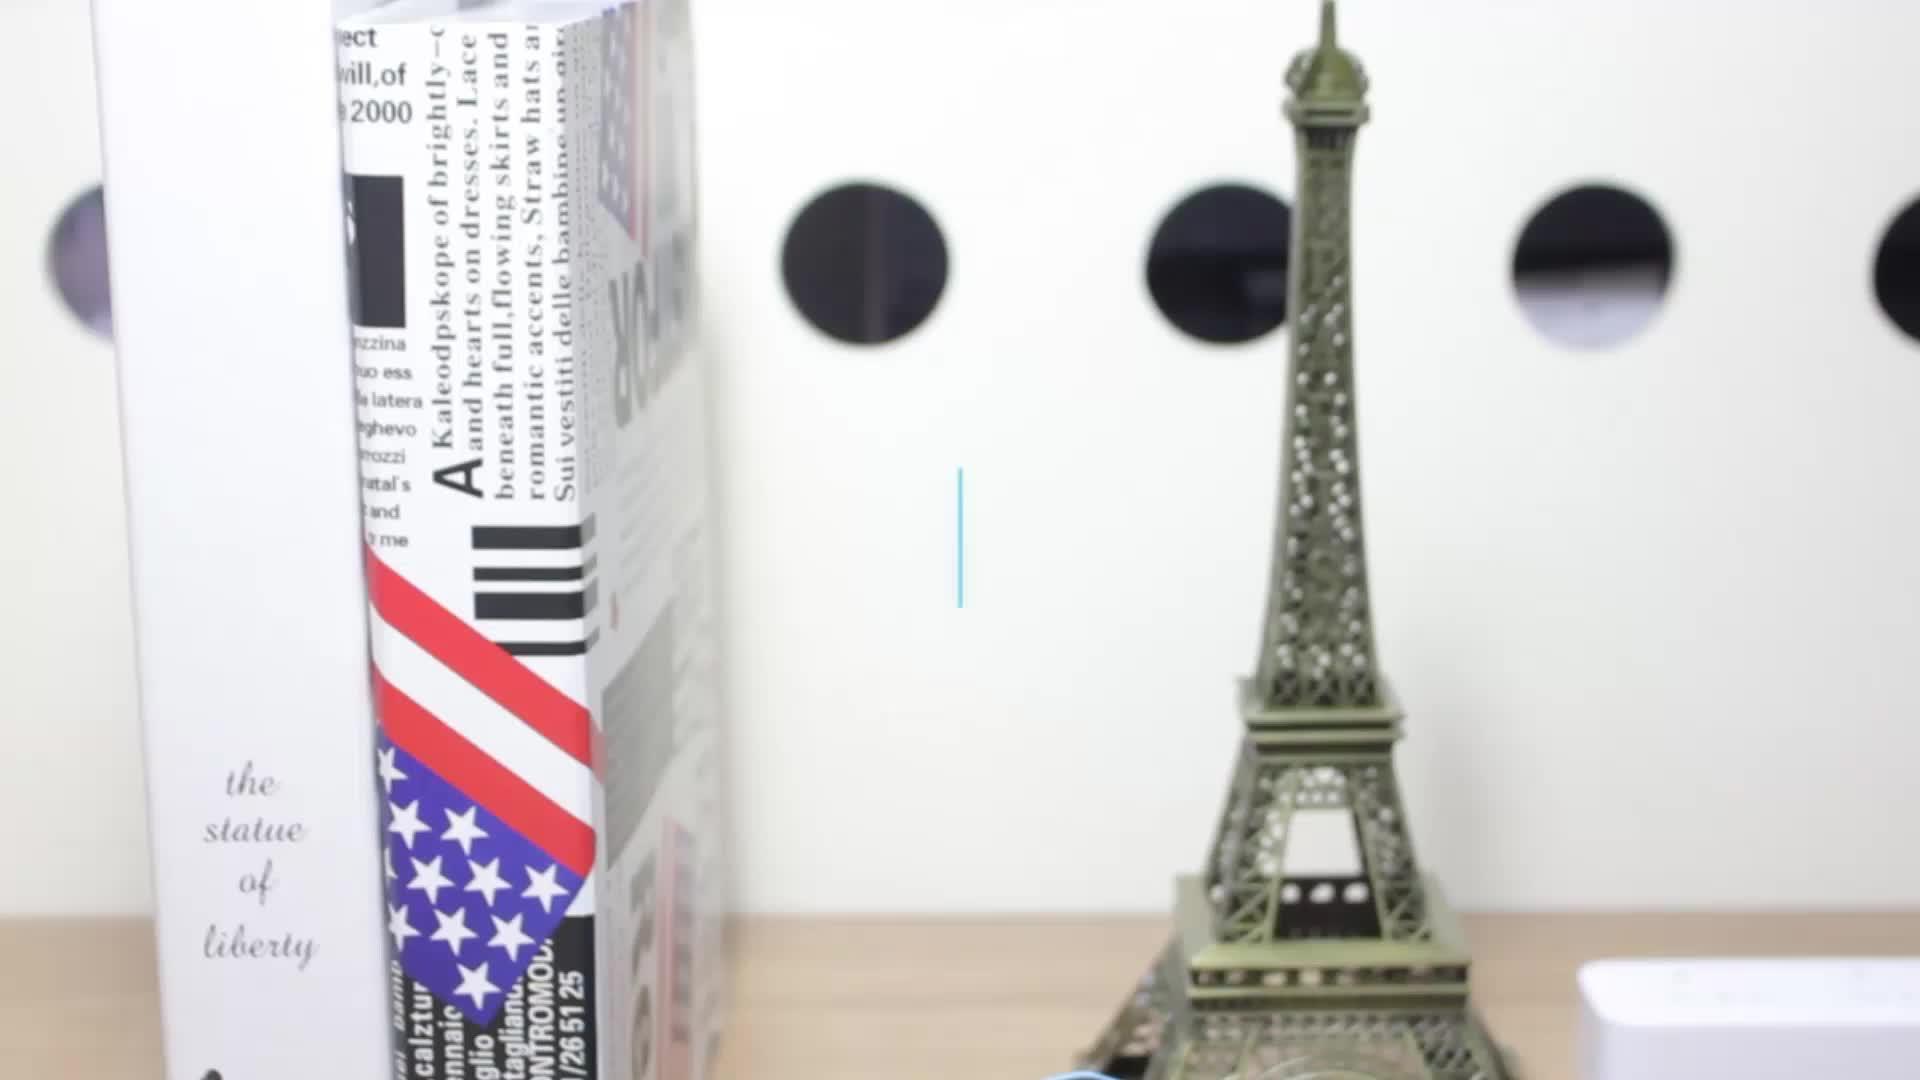 अंतरराष्ट्रीय यात्रा यूएसबी चार्जर ए. यू. ब्रिटेन अमेरिका यूरोपीय संघ प्लग यूनिवर्सल आउटलेट एडाप्टर